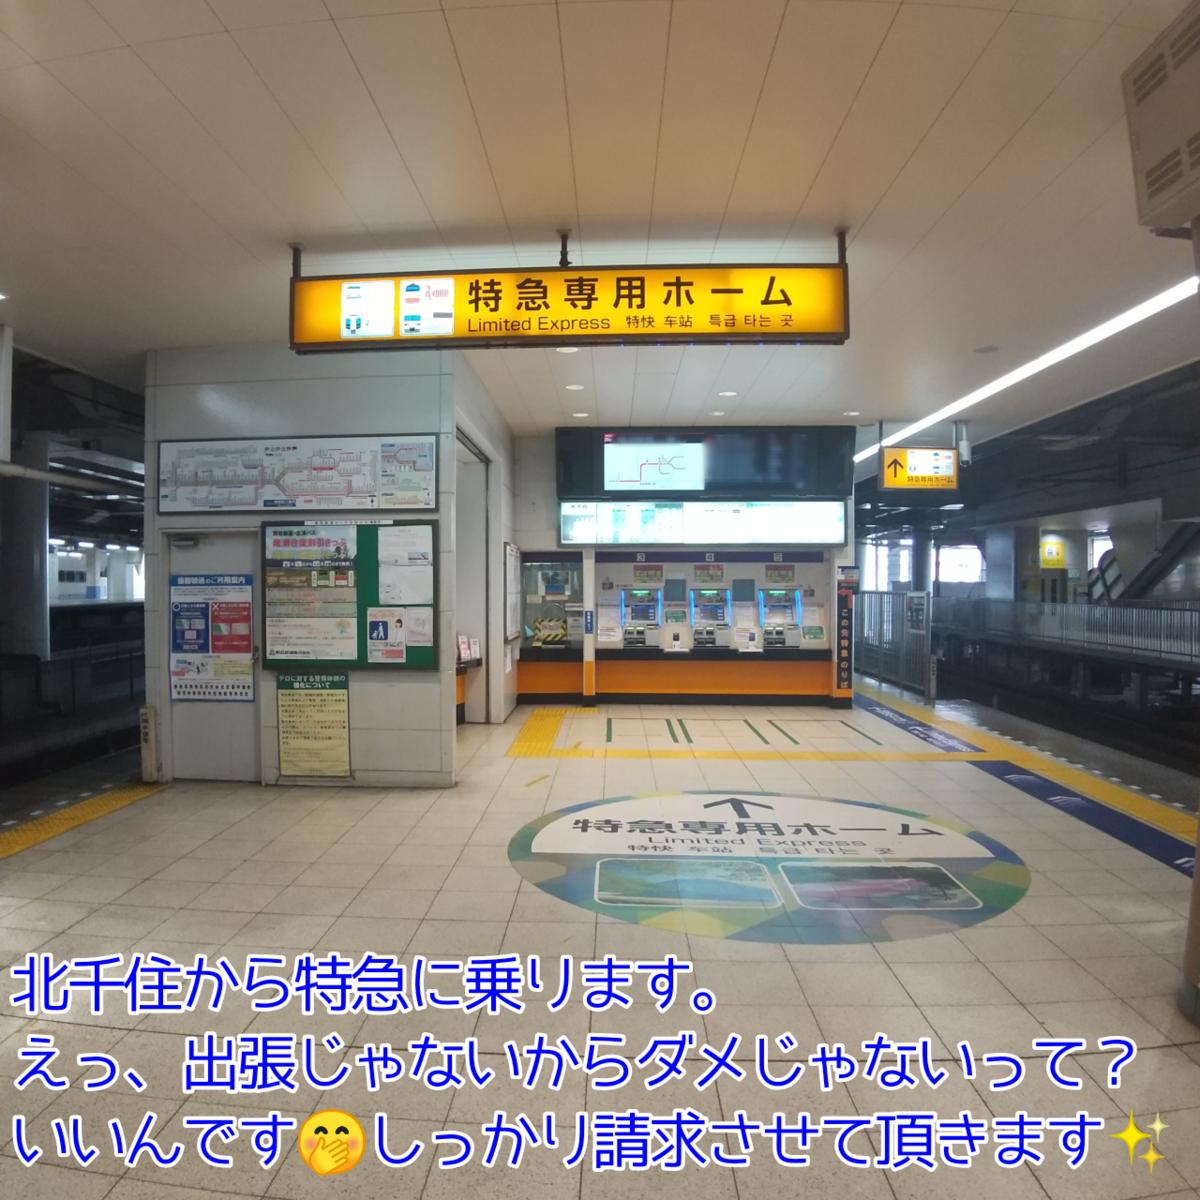 f:id:kohanakotaro:20210717150537p:plain